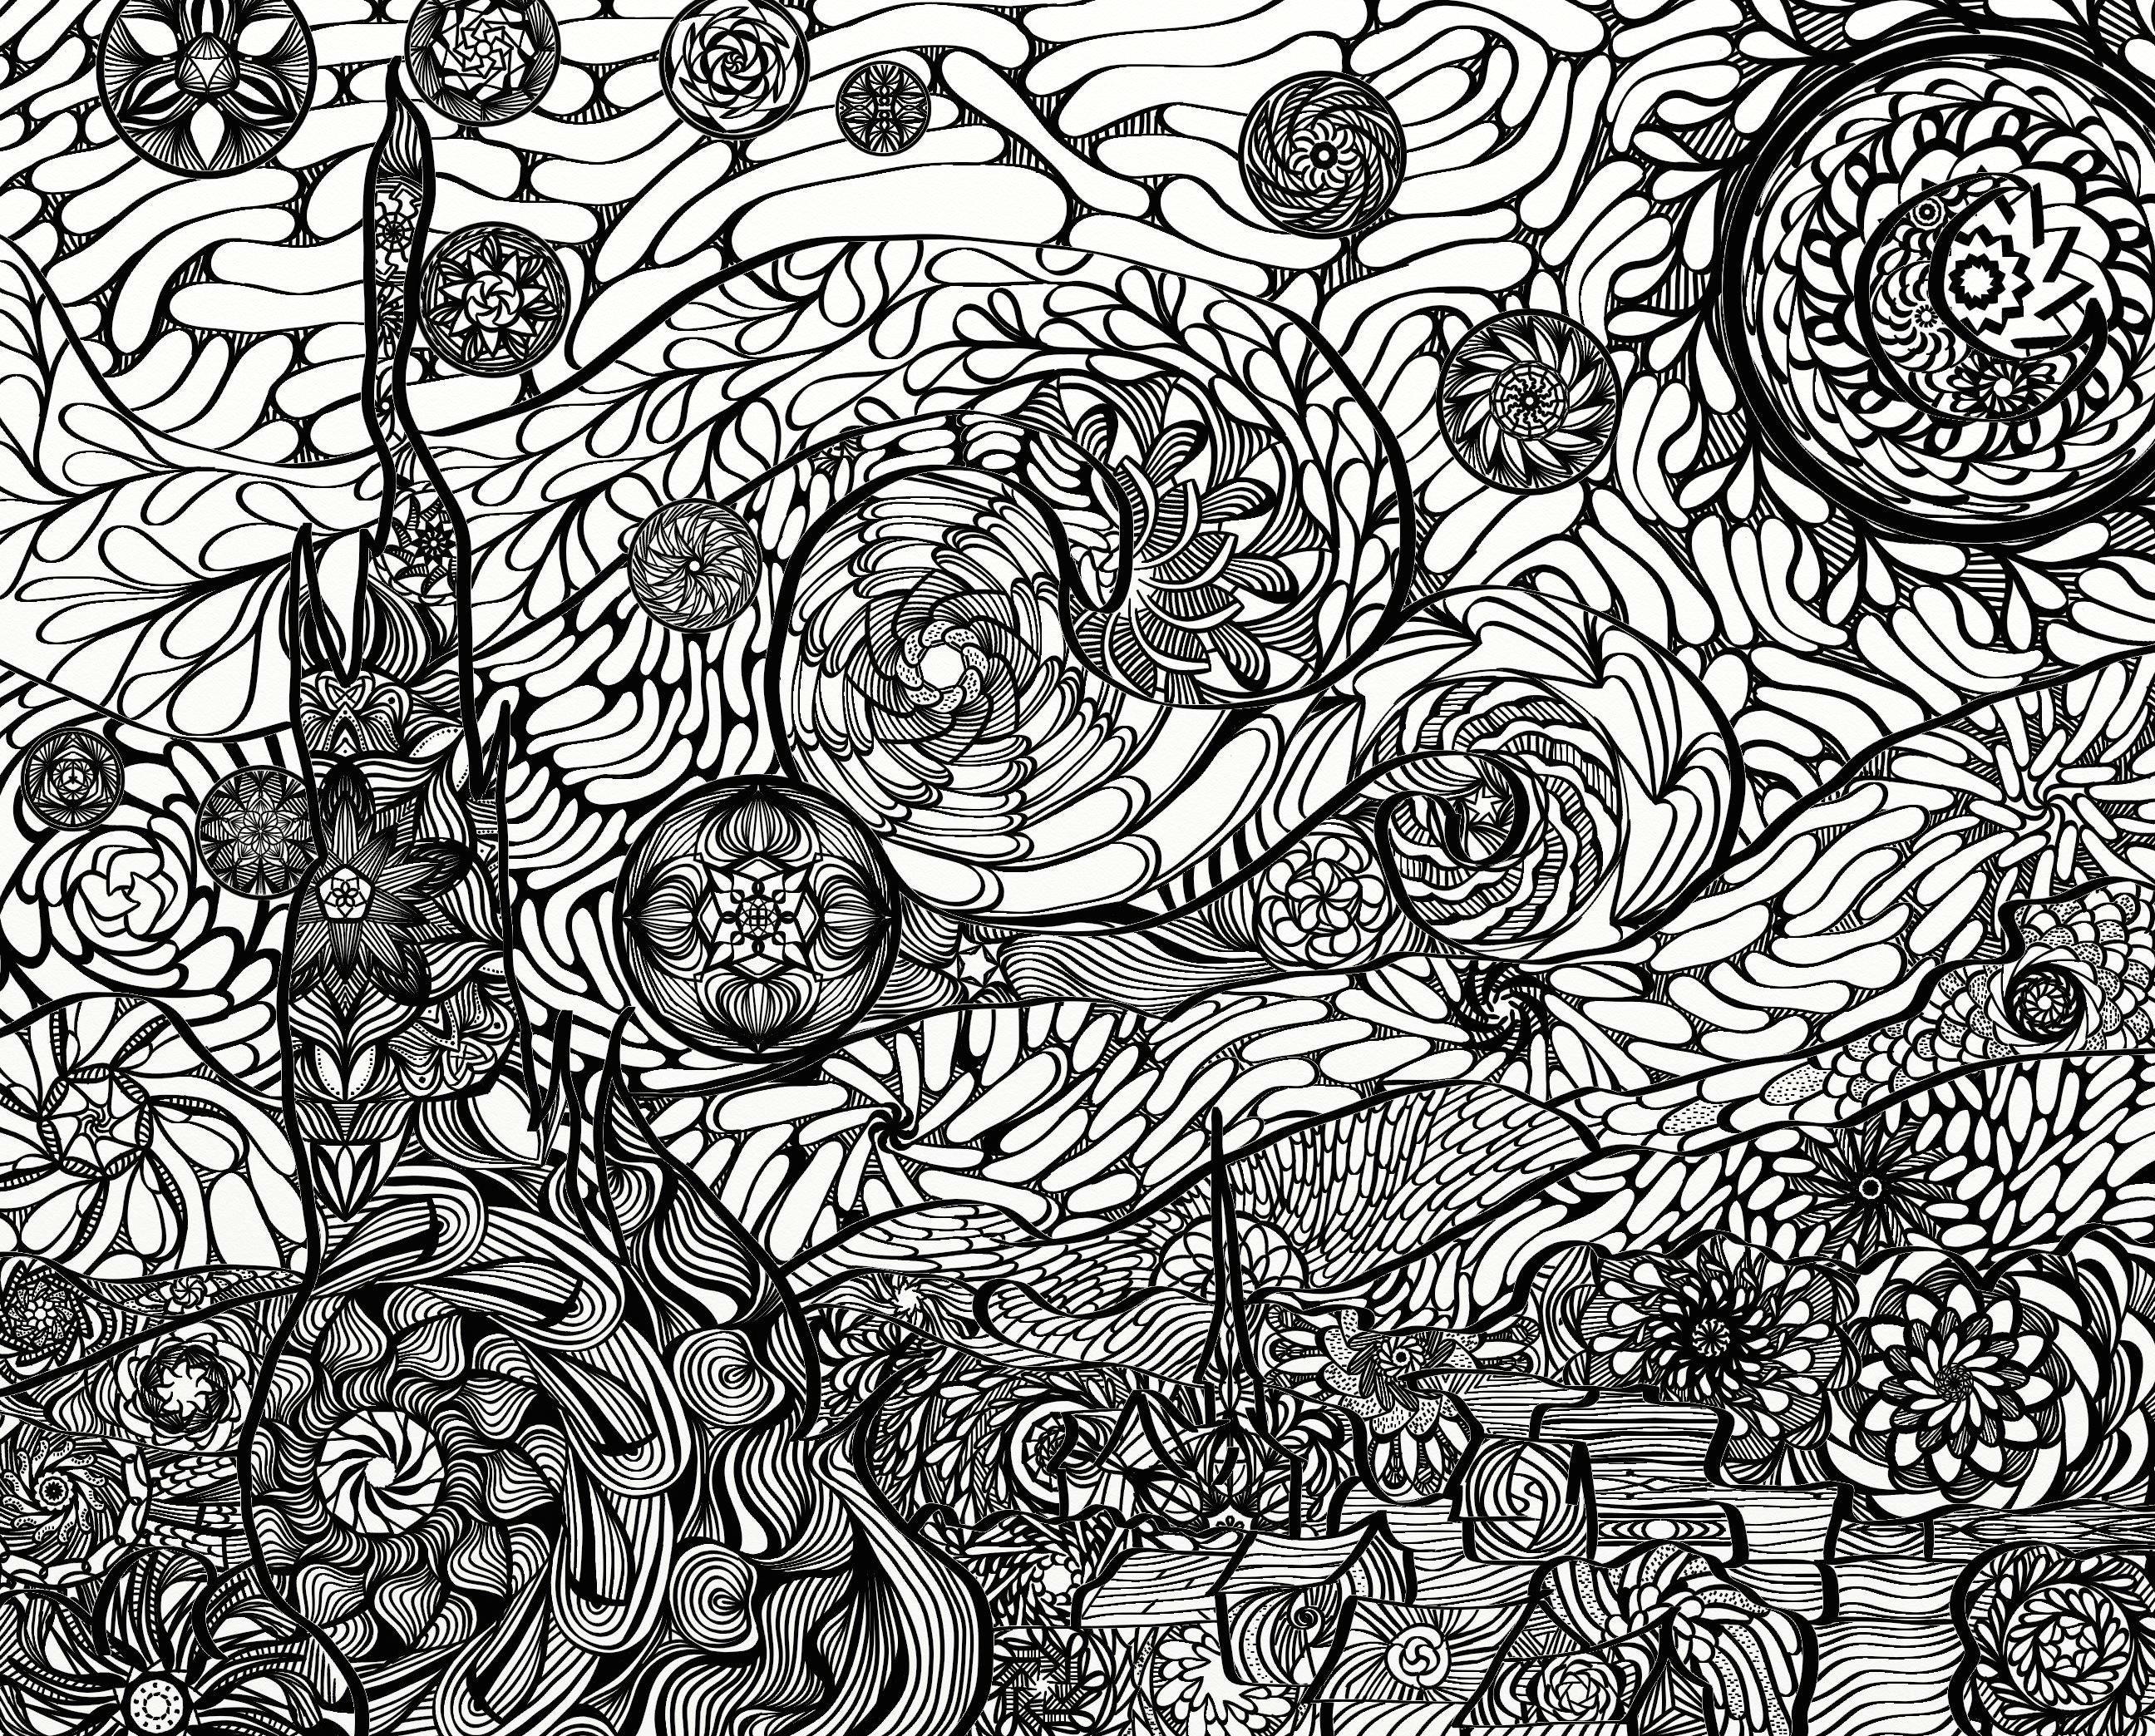 Notte stellata van gogh mandala adulto coloring page - Coloriage van gogh ...